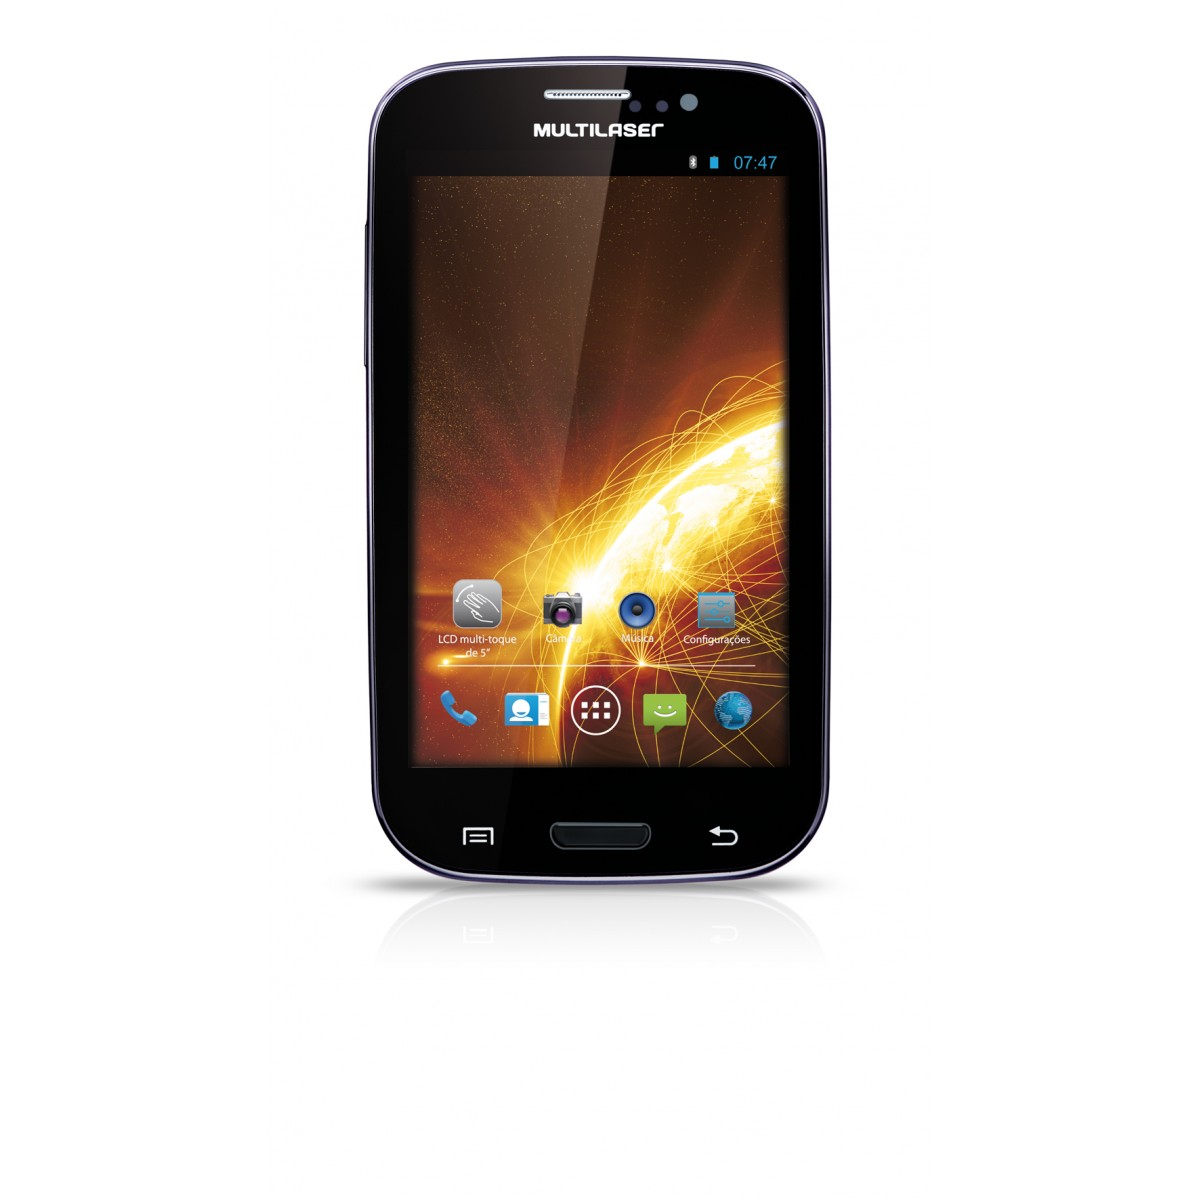 Smartphone M5 NB049 - Android 4.1, Processador Dual Core, Camera 5MP, Dual Chip, Wi-Fi, 3G, Preto